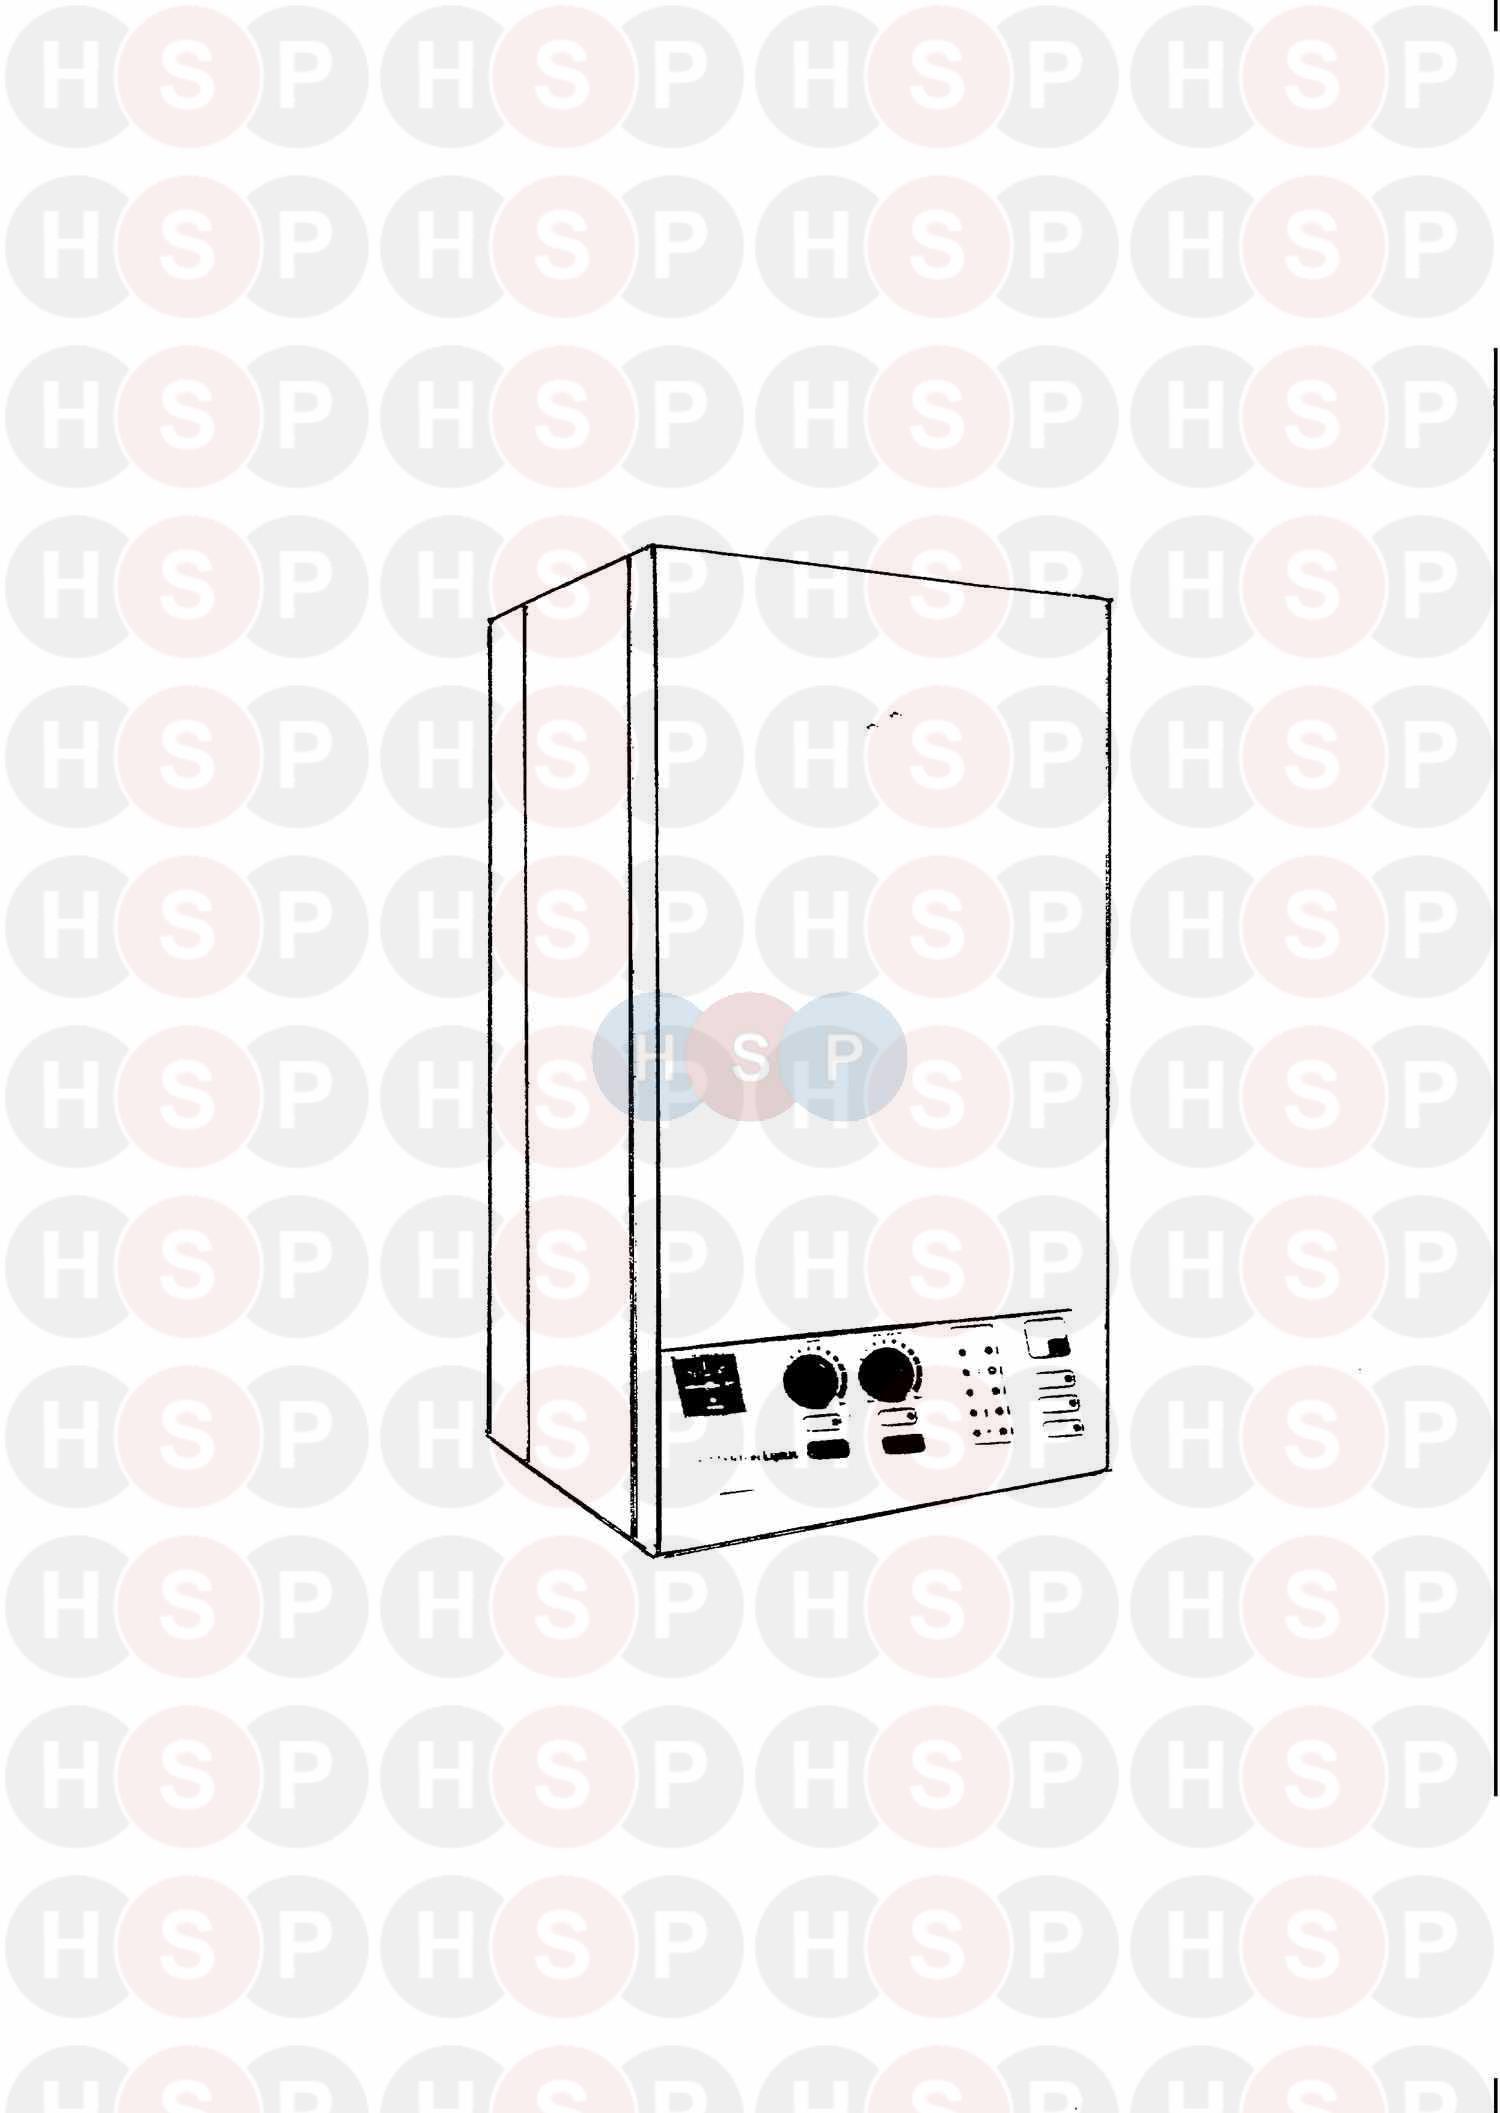 Potterton LYNX RS EARLY MODEL Appliance Diagram